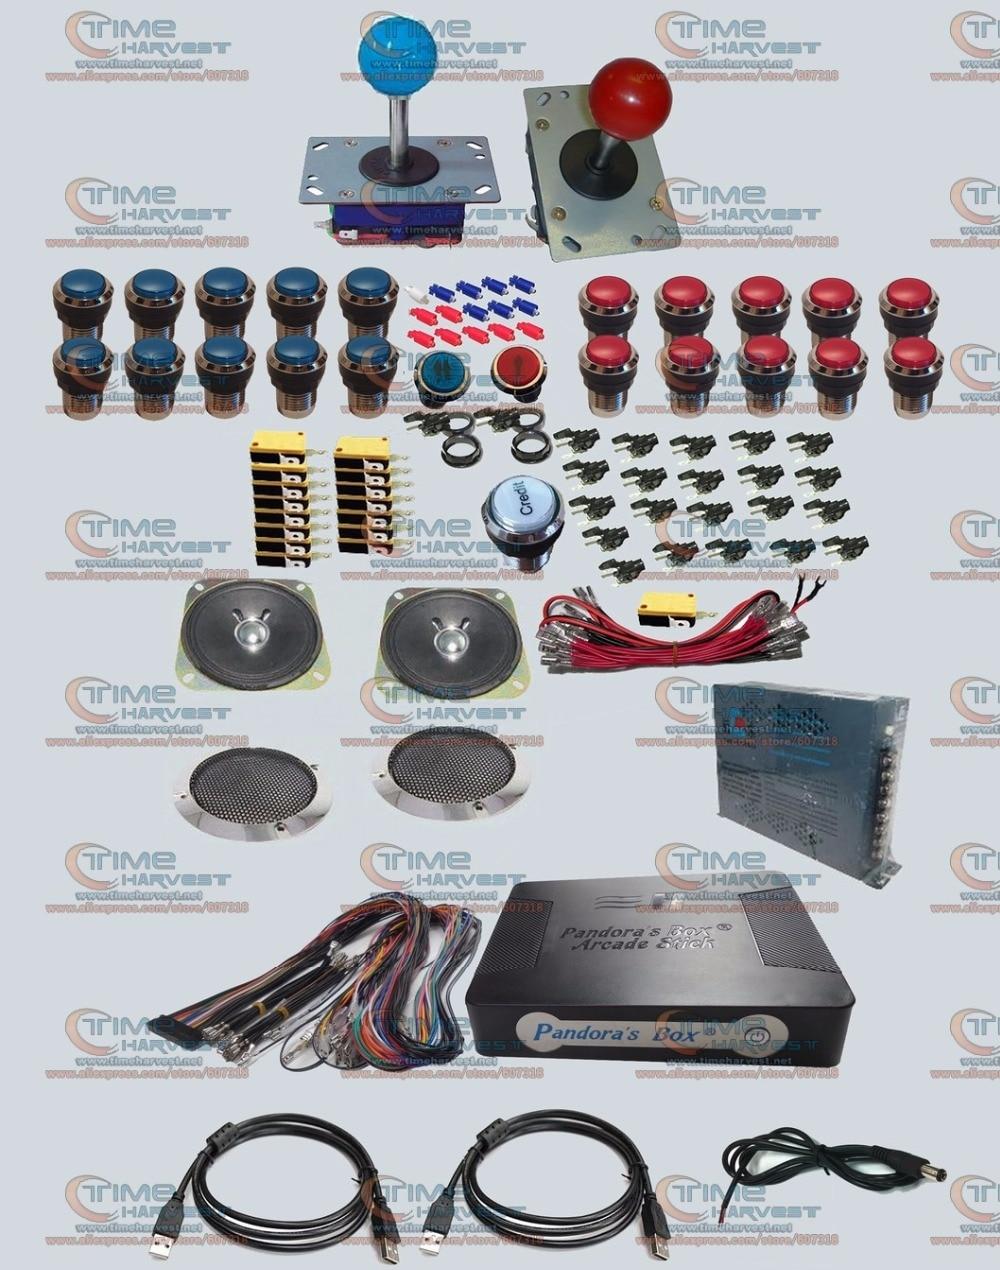 Arcade parts Bundles kit With Pandora's Box Arcade Stick Long shaft Joystick Silver illuminated button Microswitch Jamma Harness